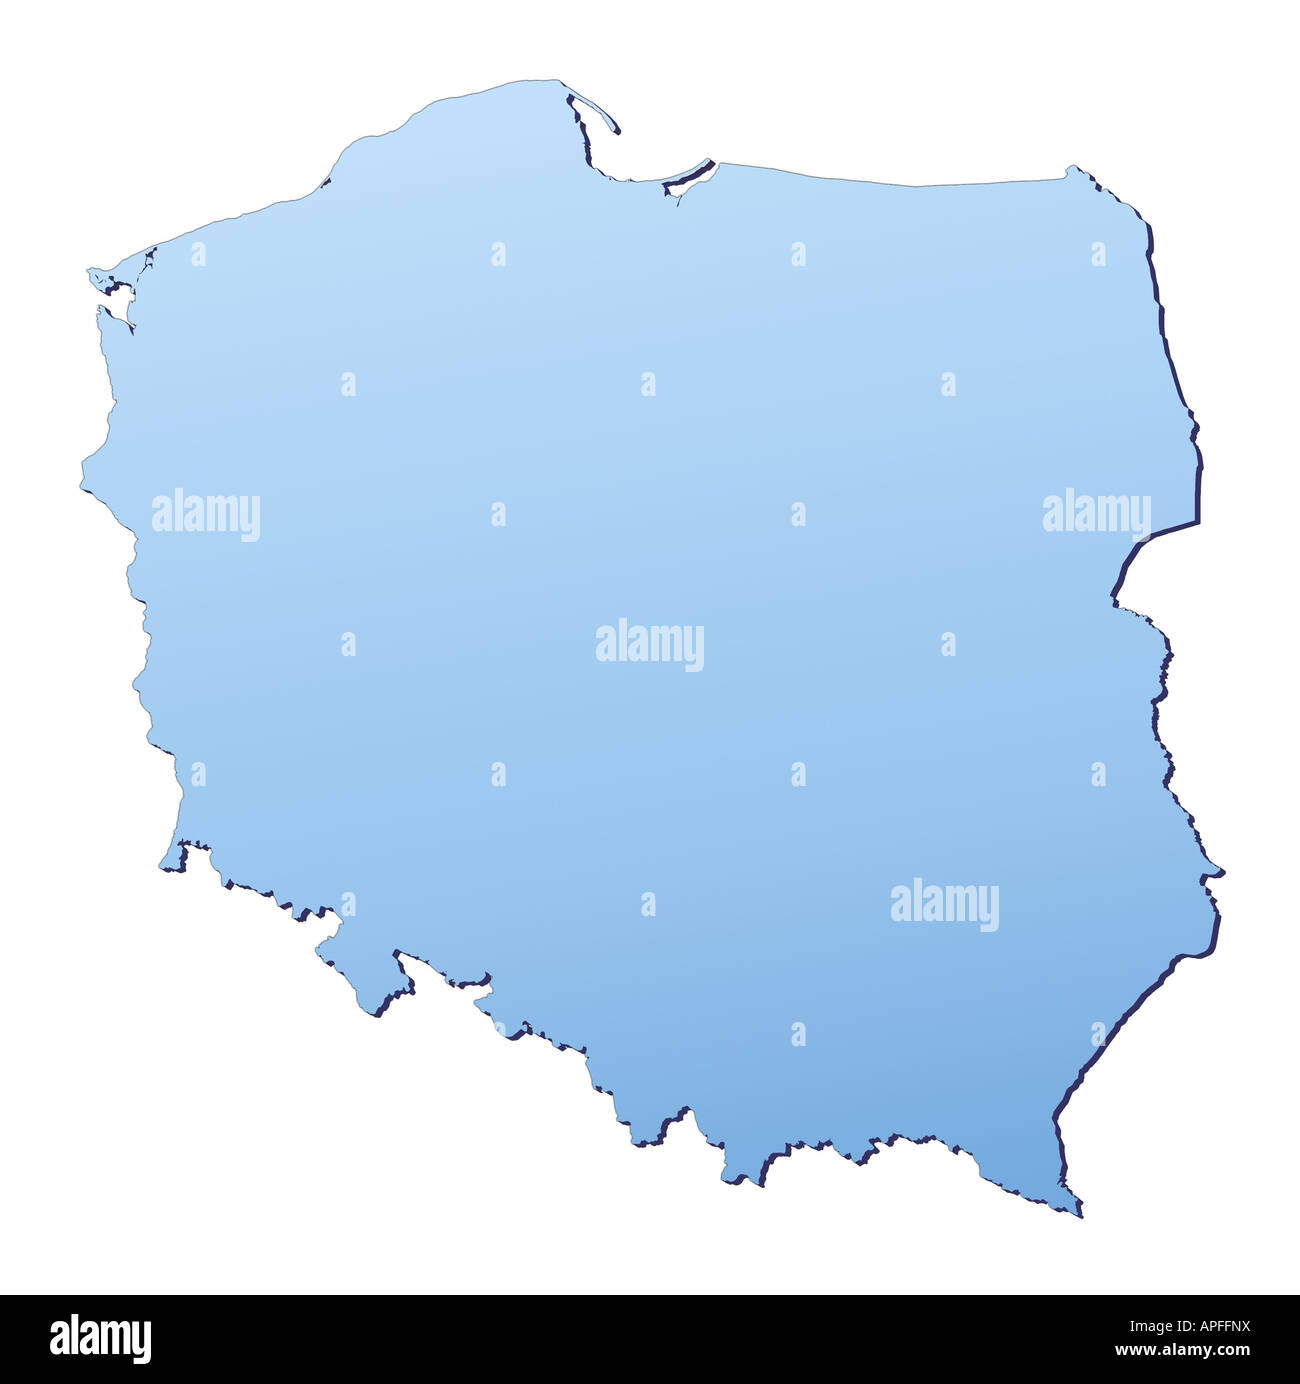 Polen Karte Umriss.Polen Karte Stockfotos Polen Karte Bilder Alamy